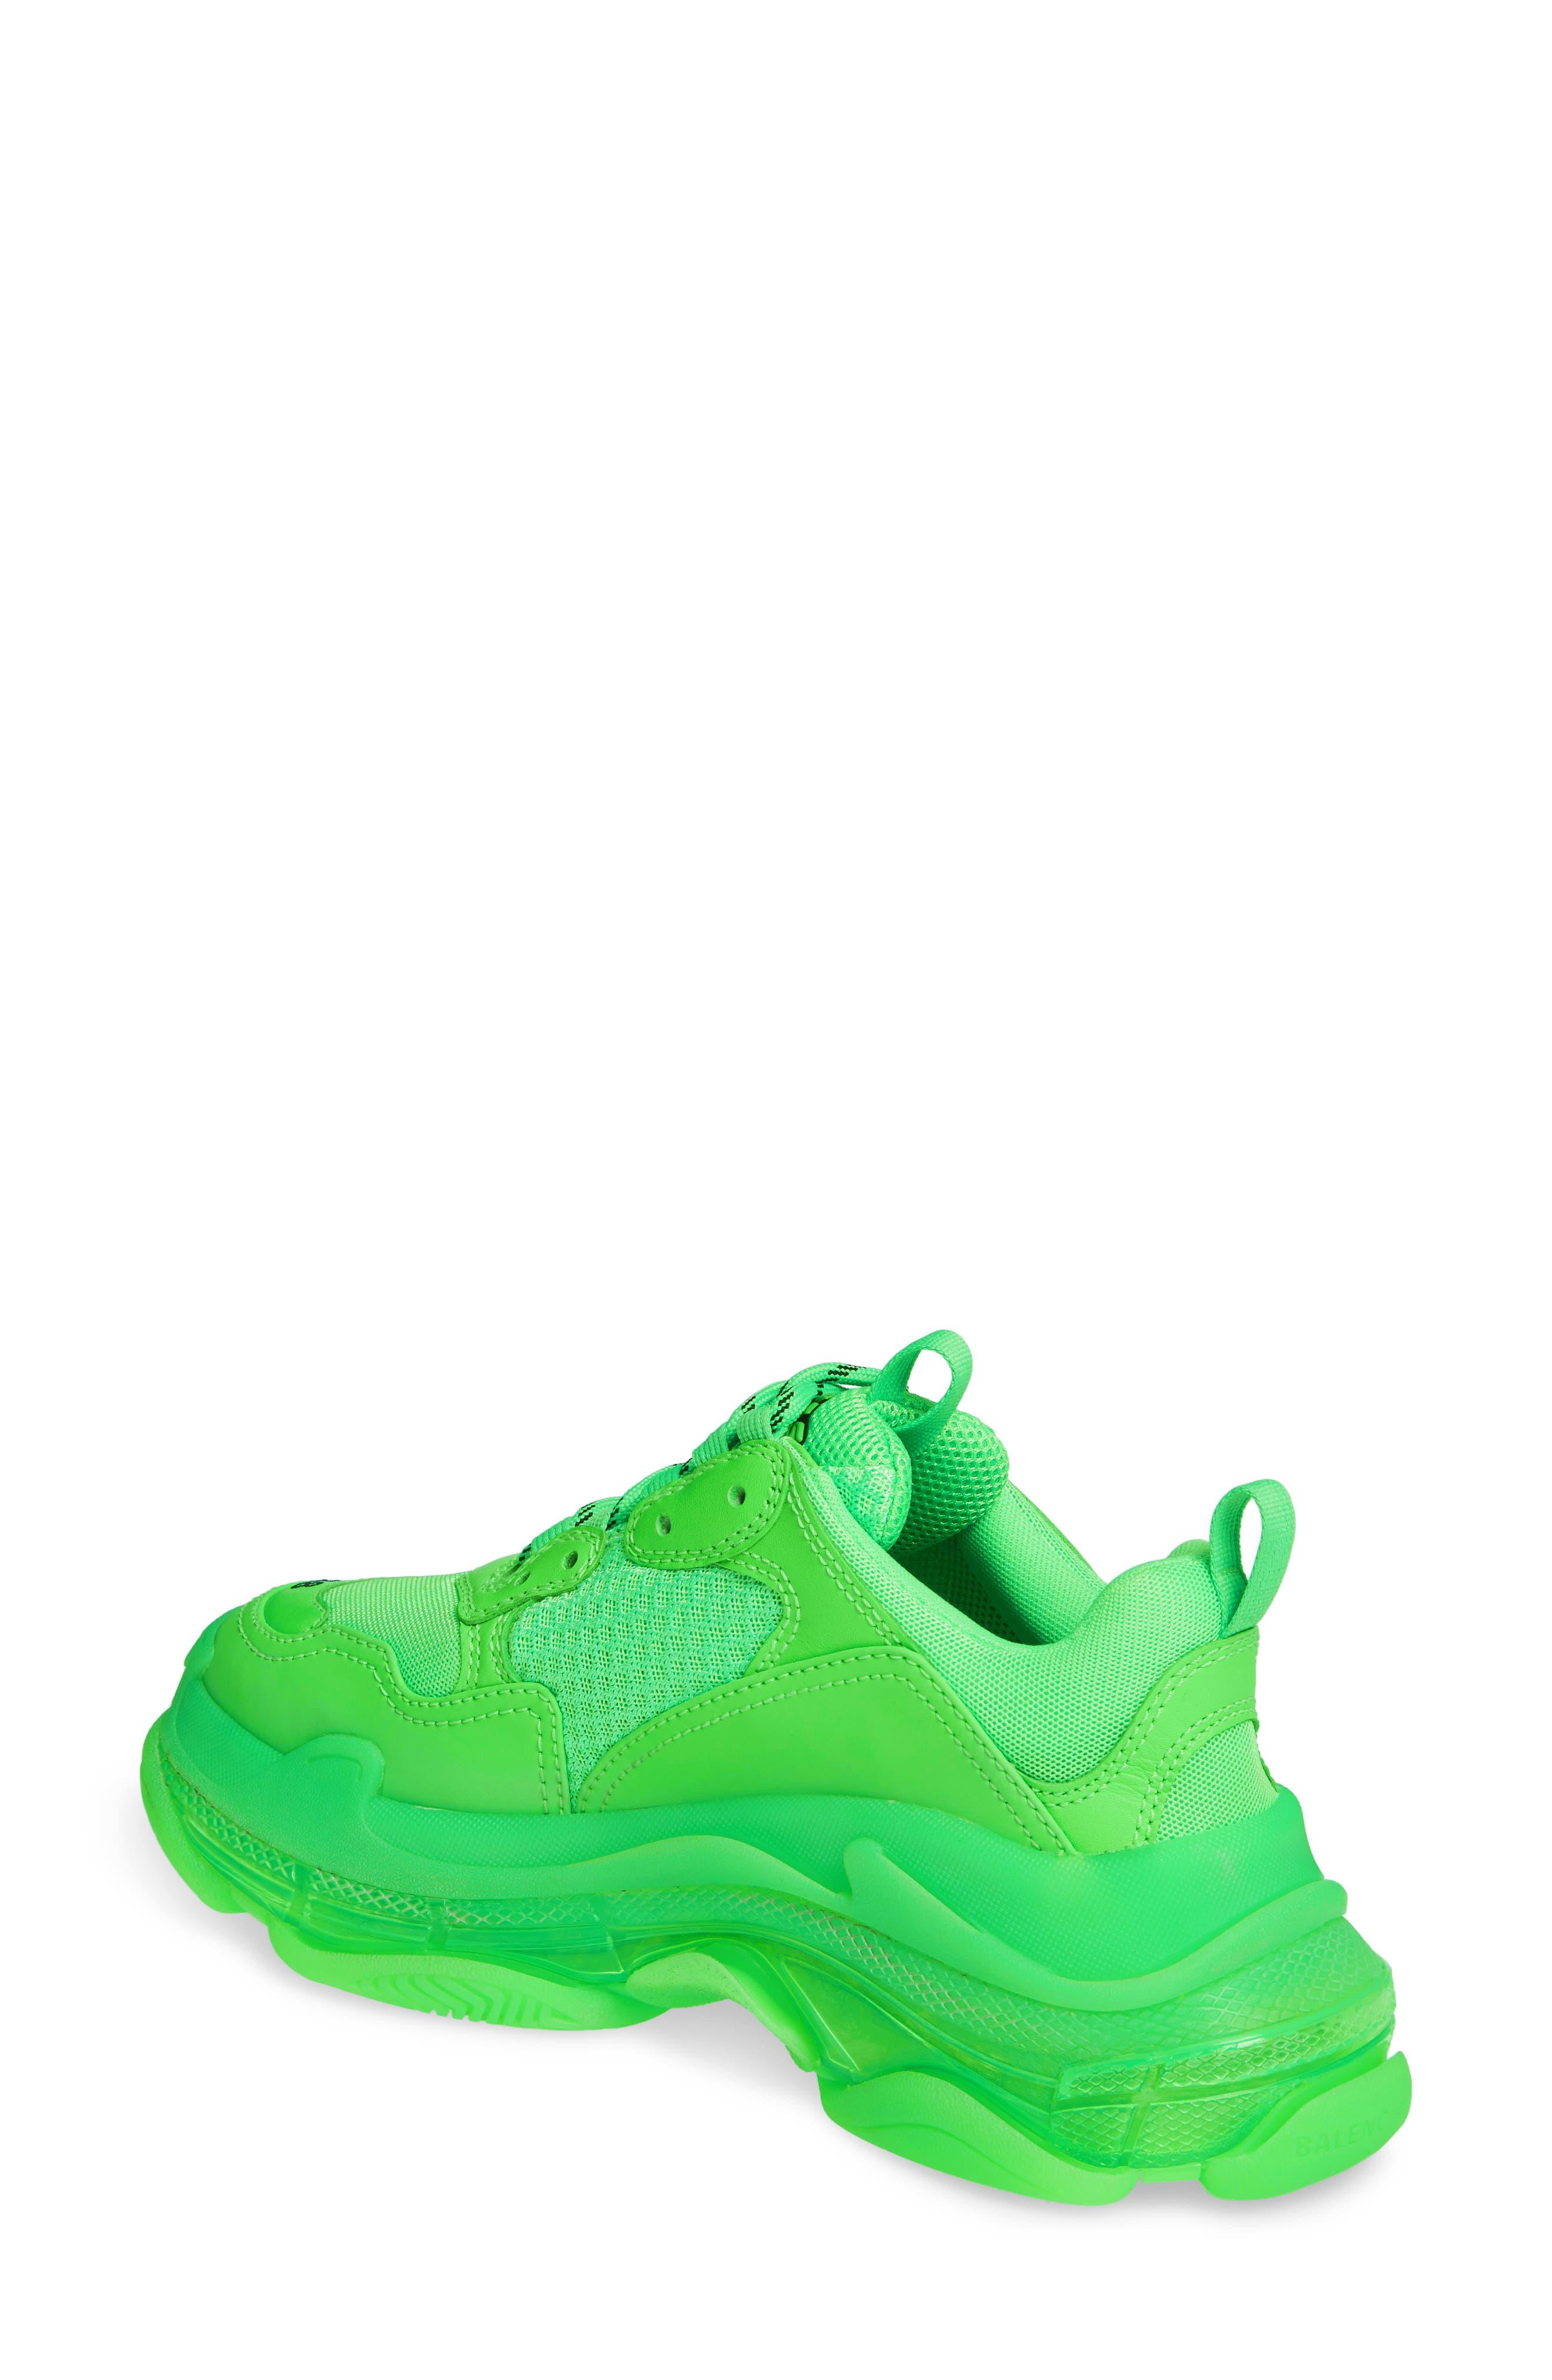 BALENCIAGA, Triple S Low Top Sneaker, Alternate thumbnail 2, color, GREEN FLUO